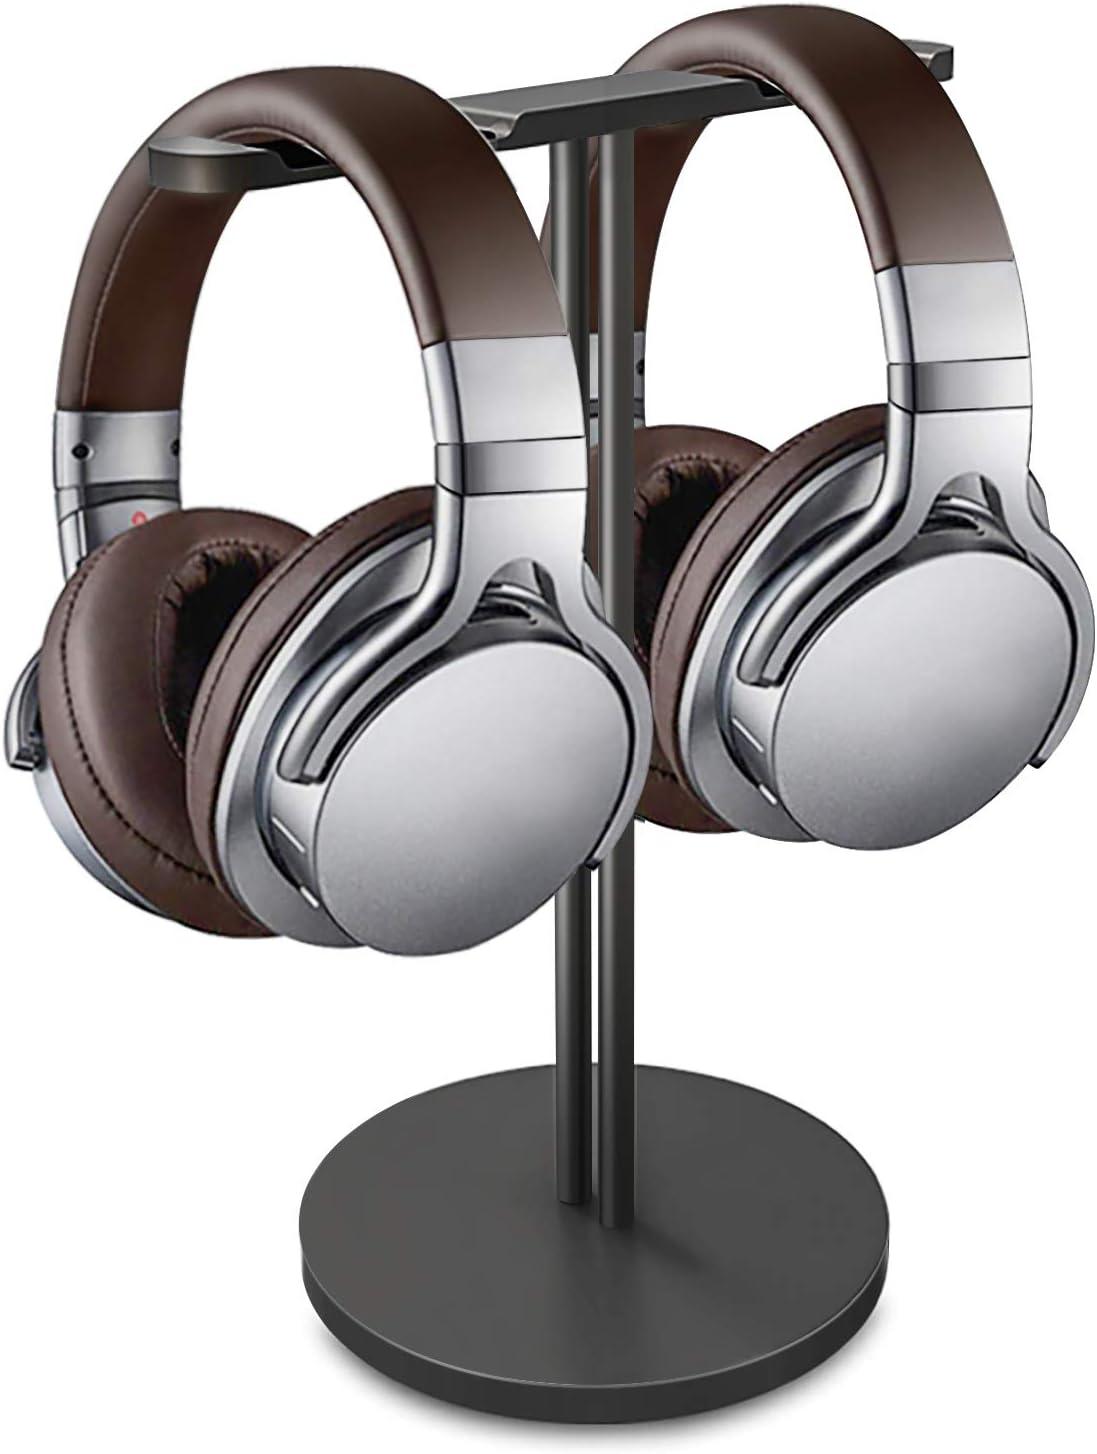 Dual Balance Headphone Stand Headset Aluminum New York OFFicial Mall Gam Double